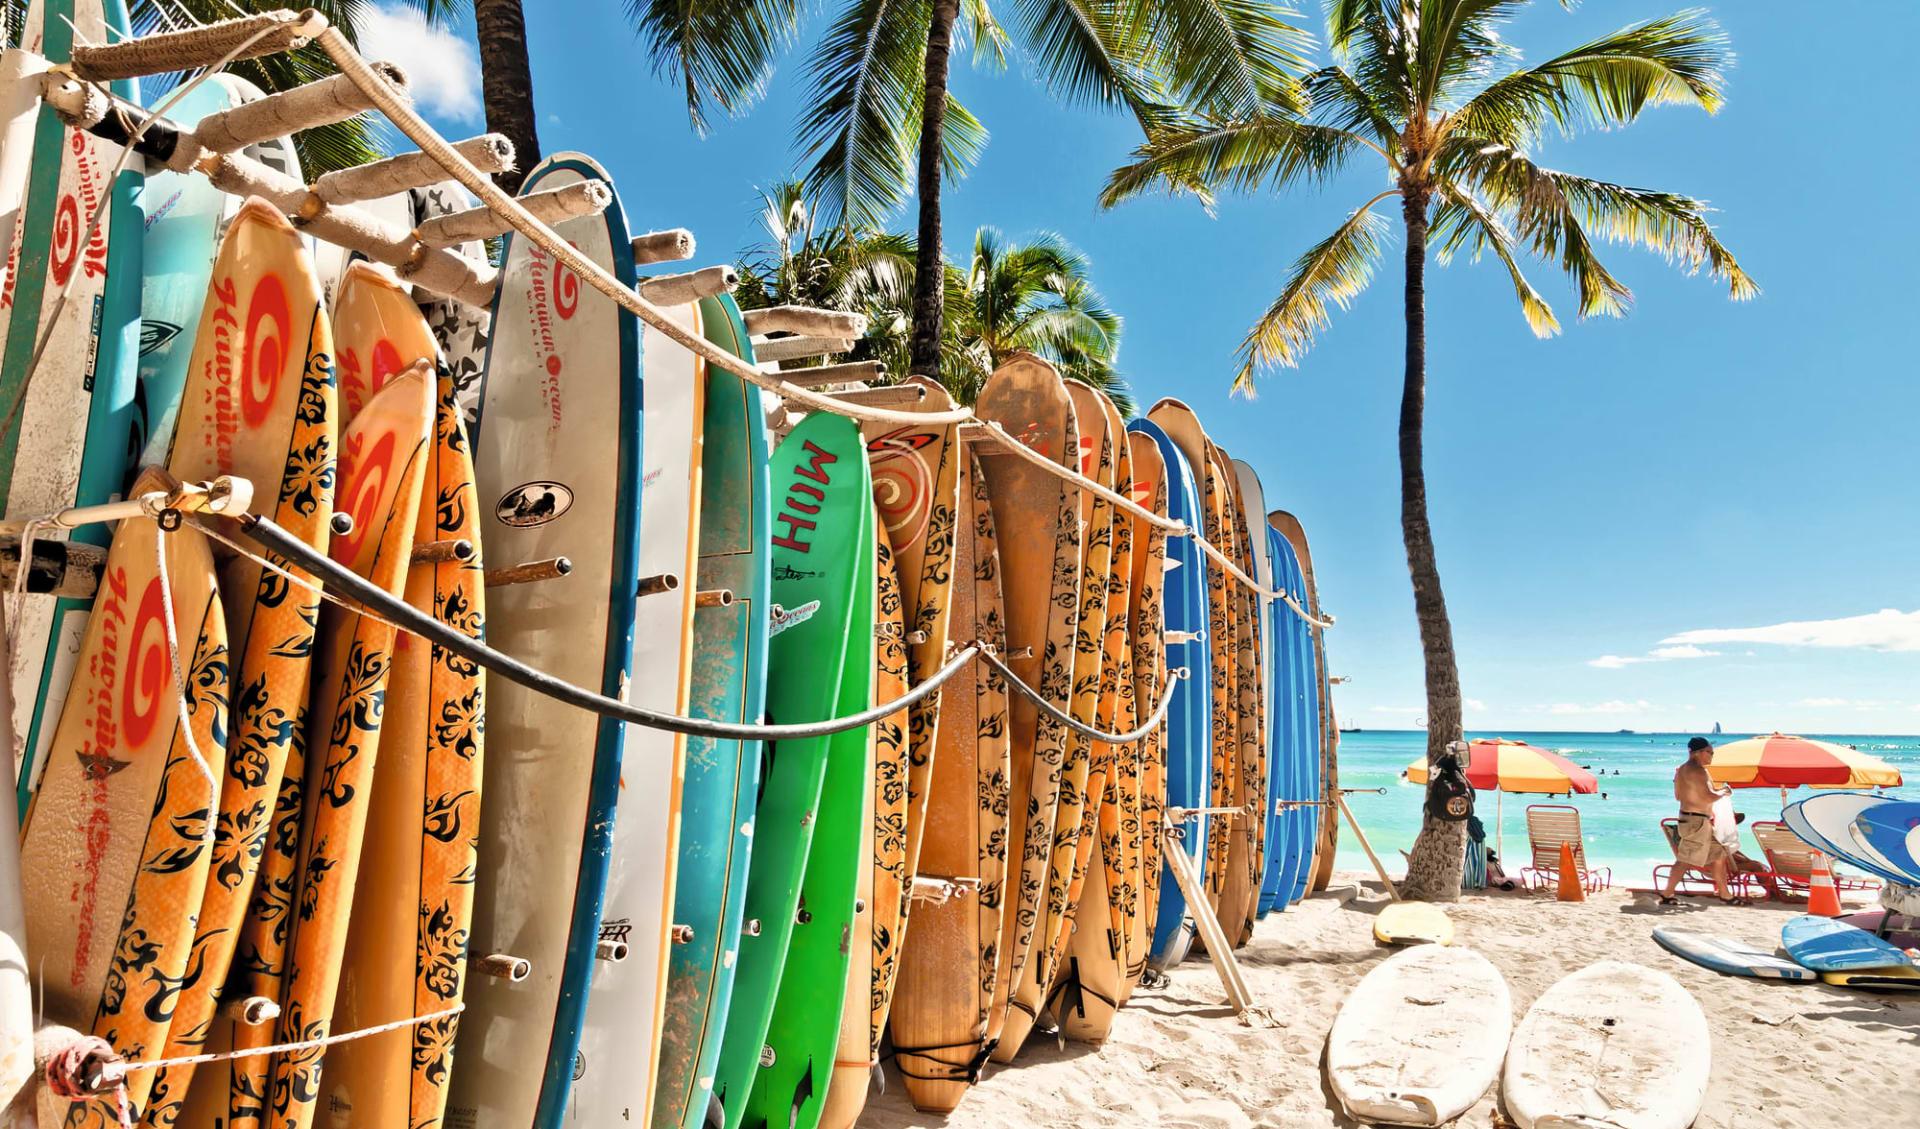 Hawaii Island Hopping ab Honolulu - Oahu: Hawaii - Waikiki Beach - Surfbretter